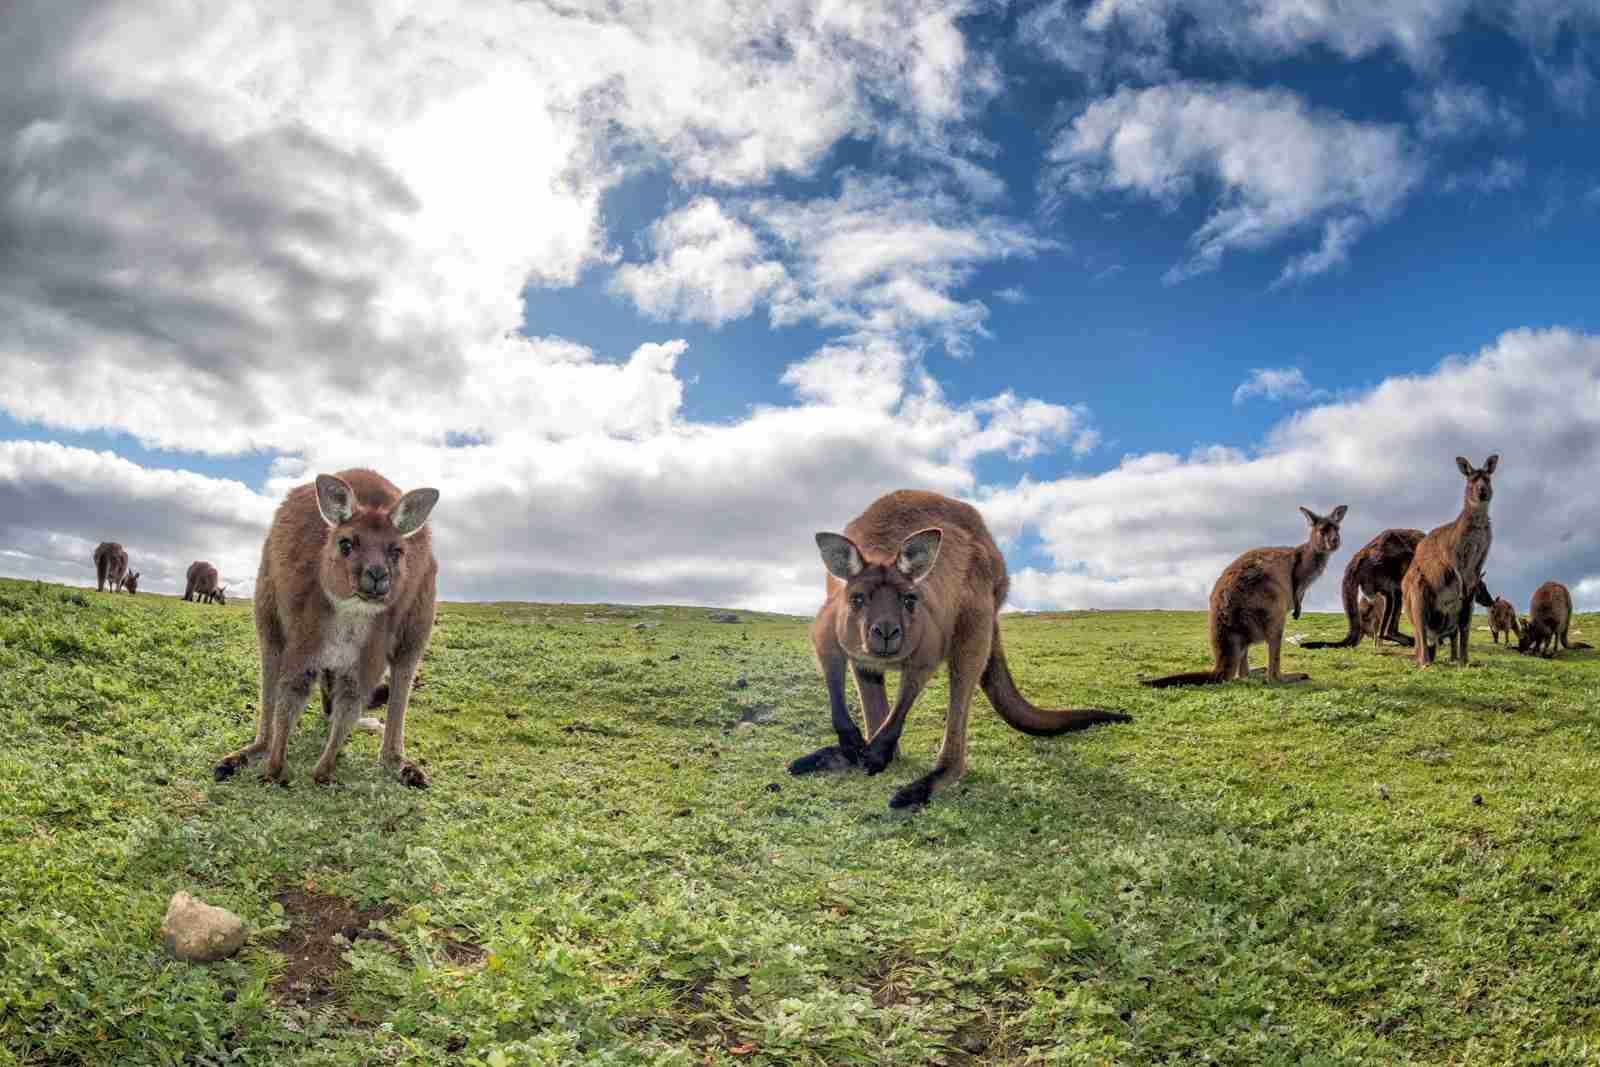 Kangaroo Island. (Photo by Andrea Izzotti/Shutterstock)